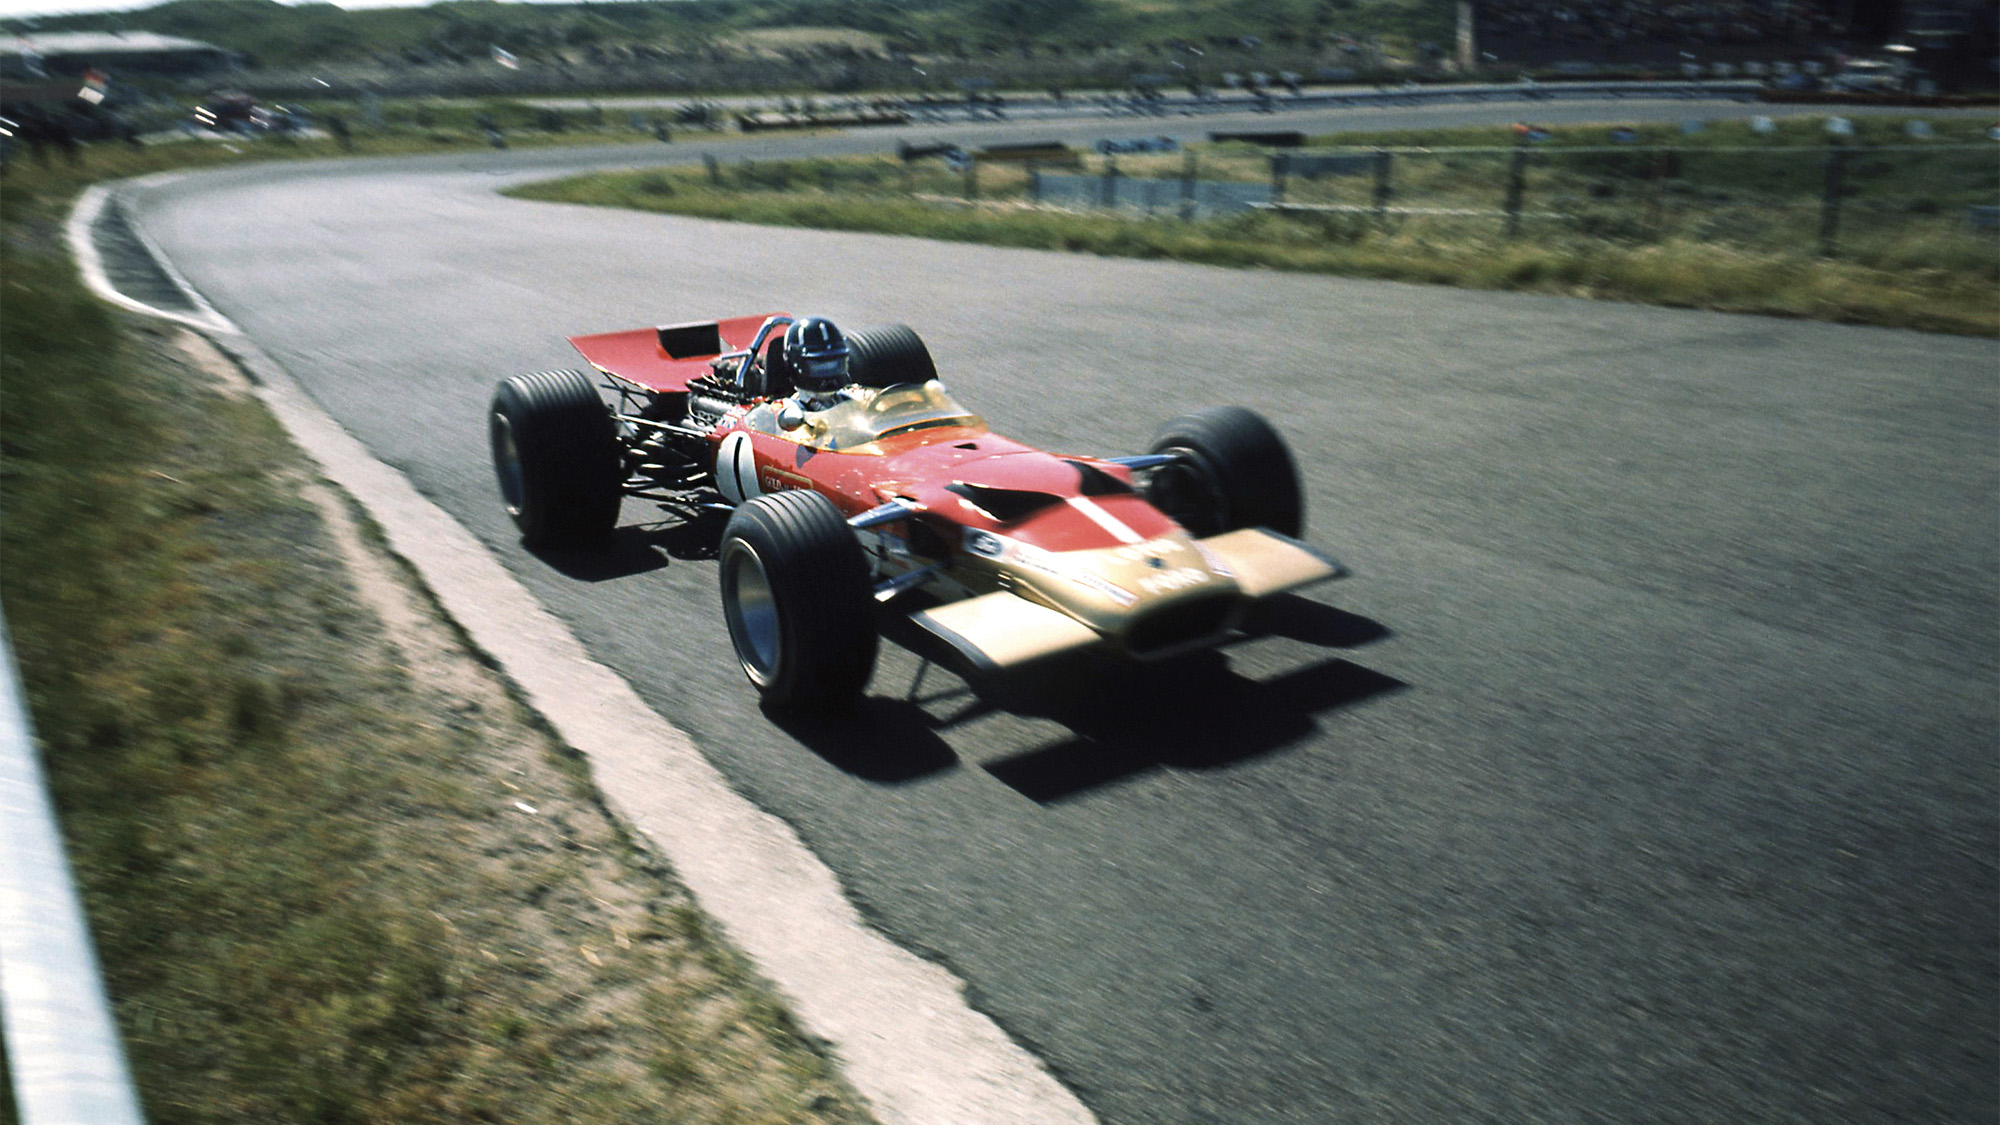 Graham Hill's Lotus at Zandvoort in the 1968 Dutch Grand Prix